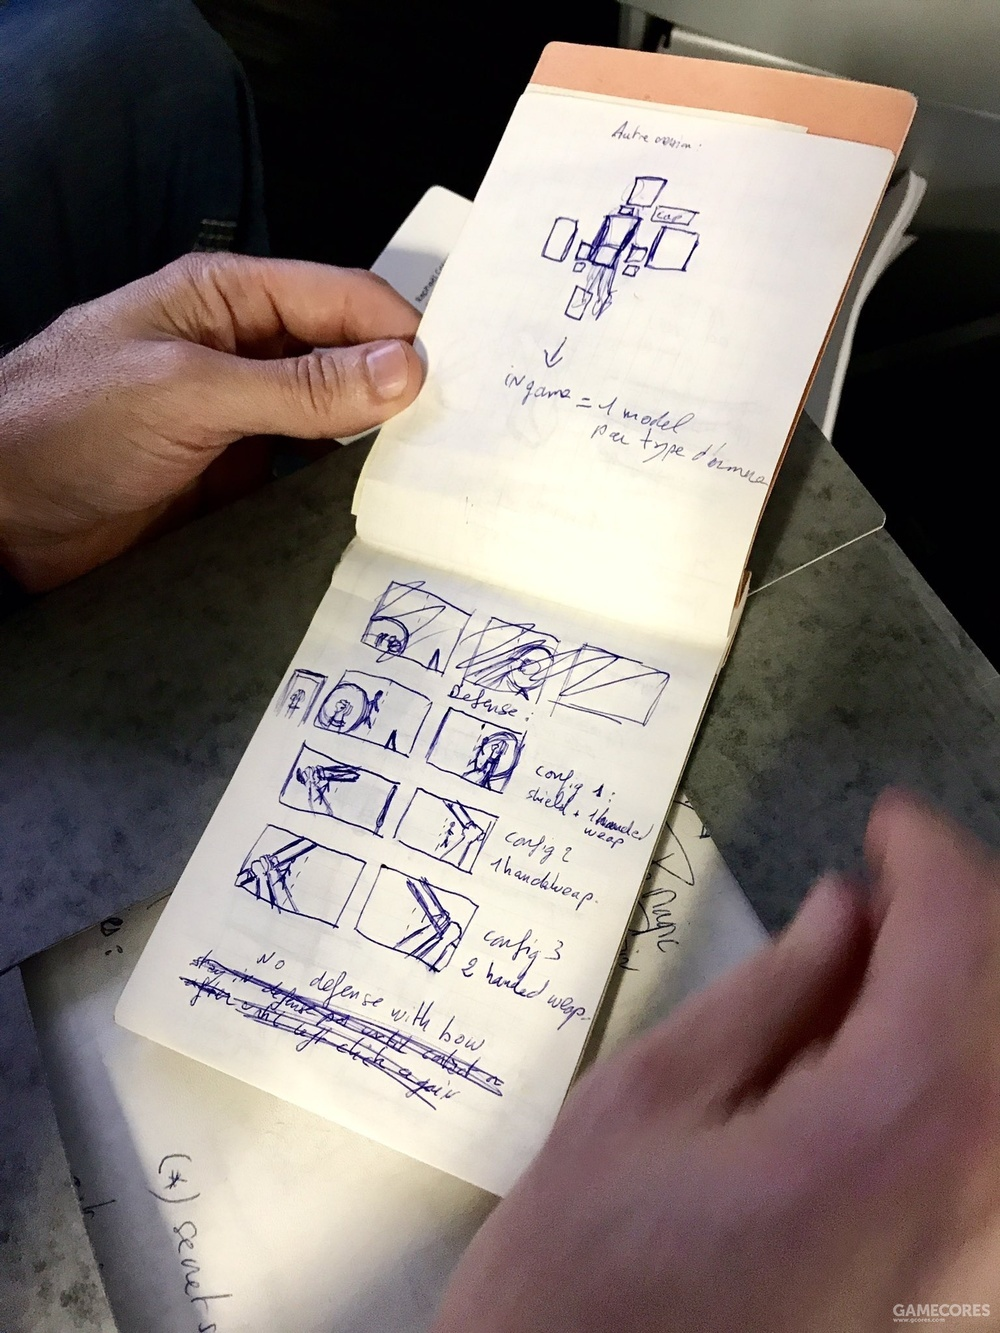 Raf离职时翻出来的Arx设计笔记,又有趣同时又令人唏嘘